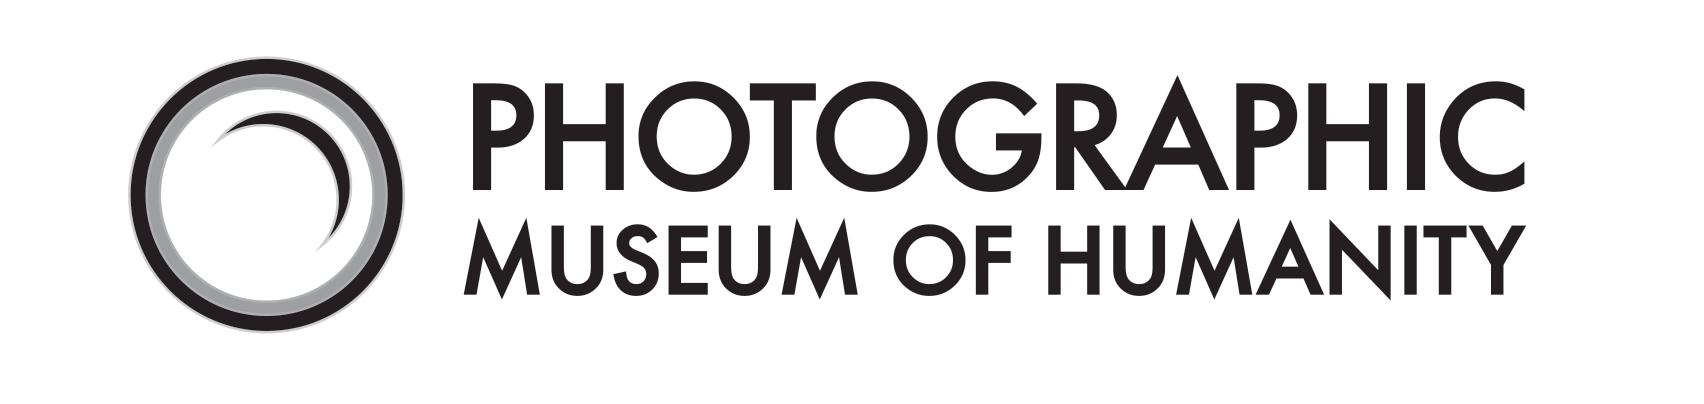 PHmuseum 2019 Photography Grant - logo